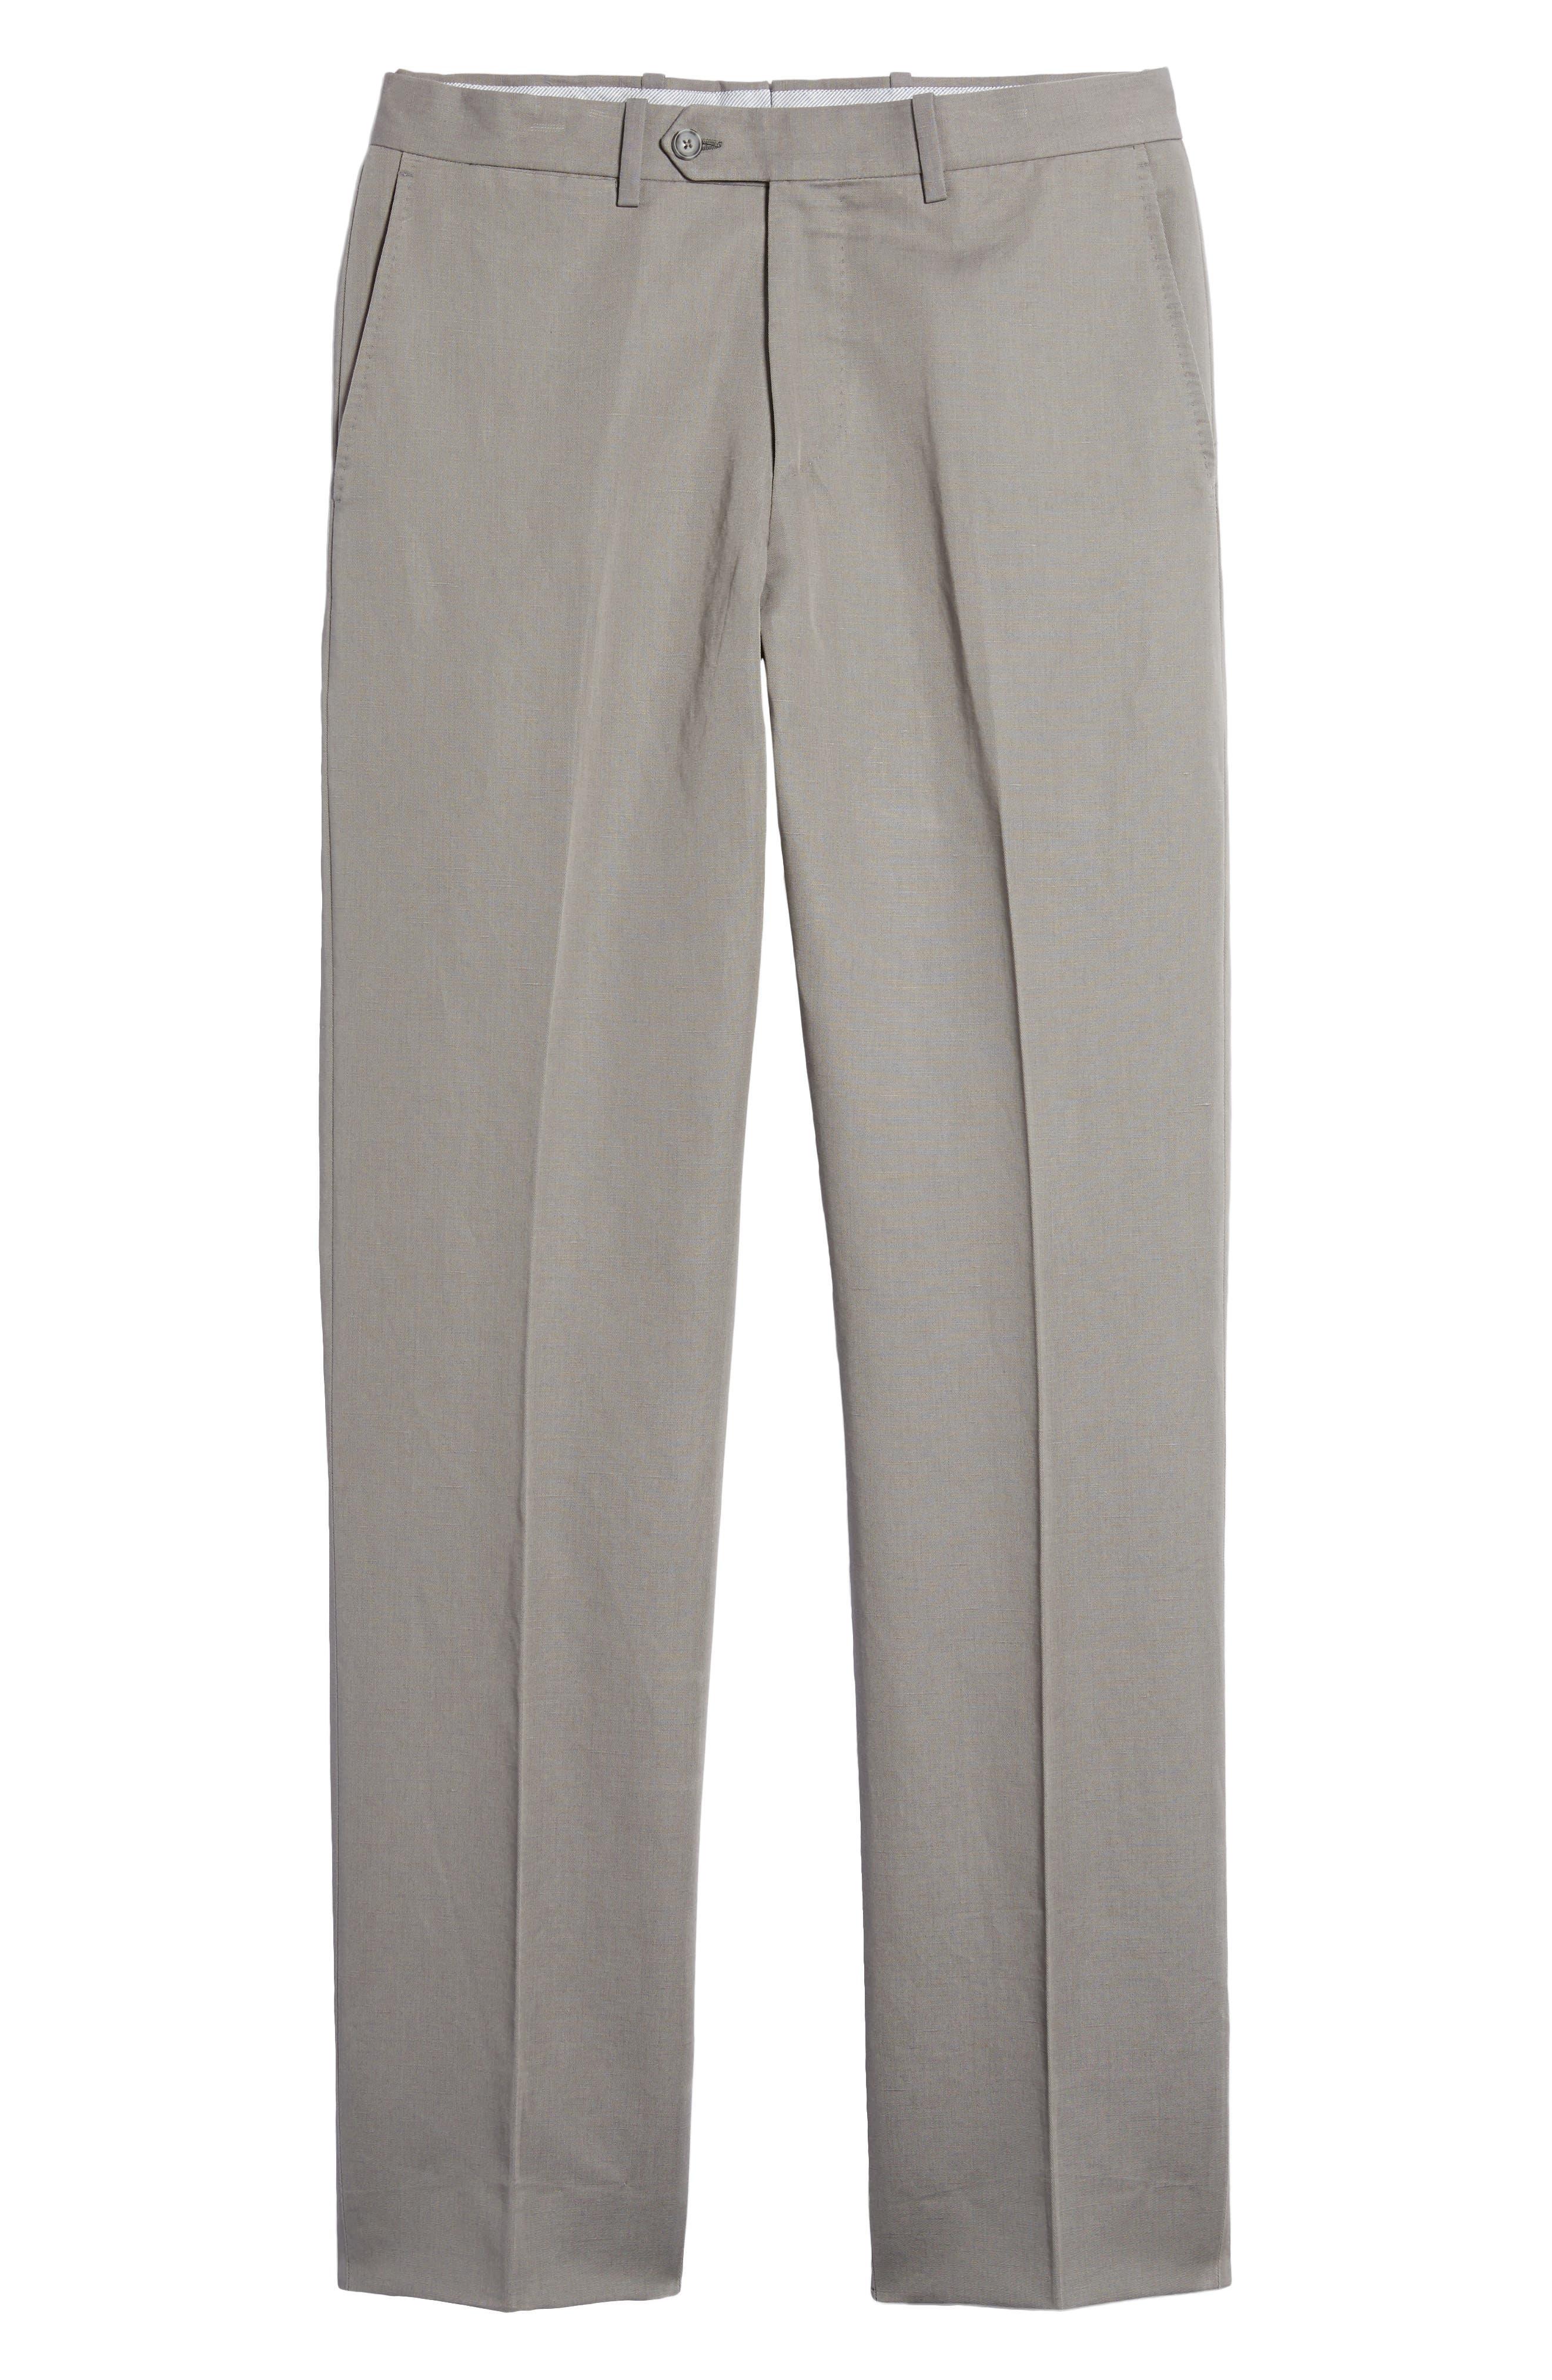 Flat Front Solid Cotton & Linen Trousers,                             Alternate thumbnail 6, color,                             030